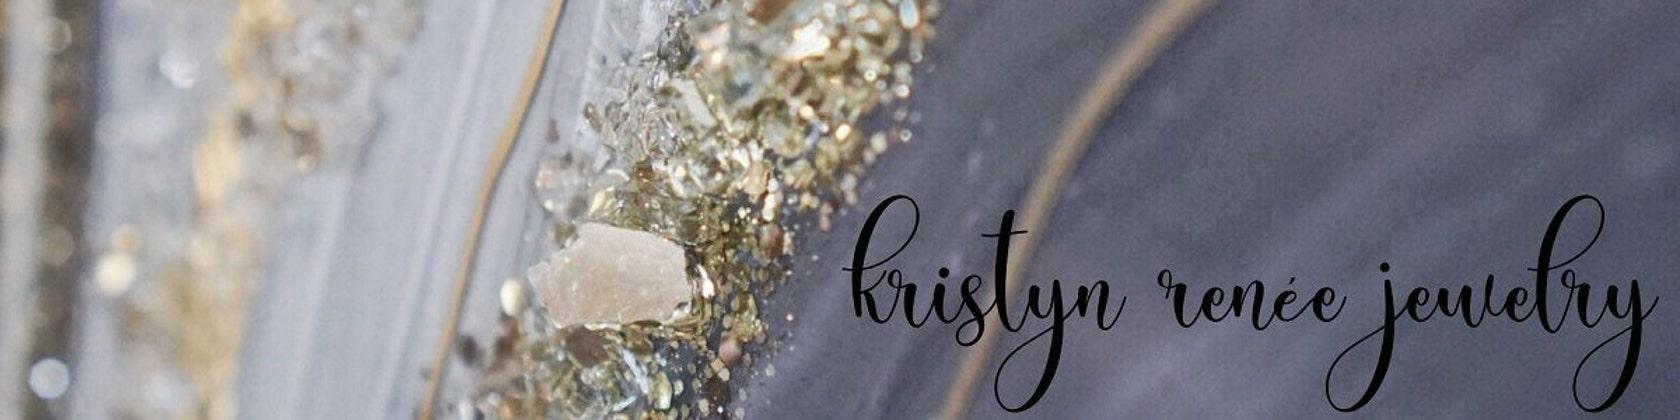 Featuring Kristynreneejewelry Handmade Jewelry Von Natural Druzy lFK1Jc